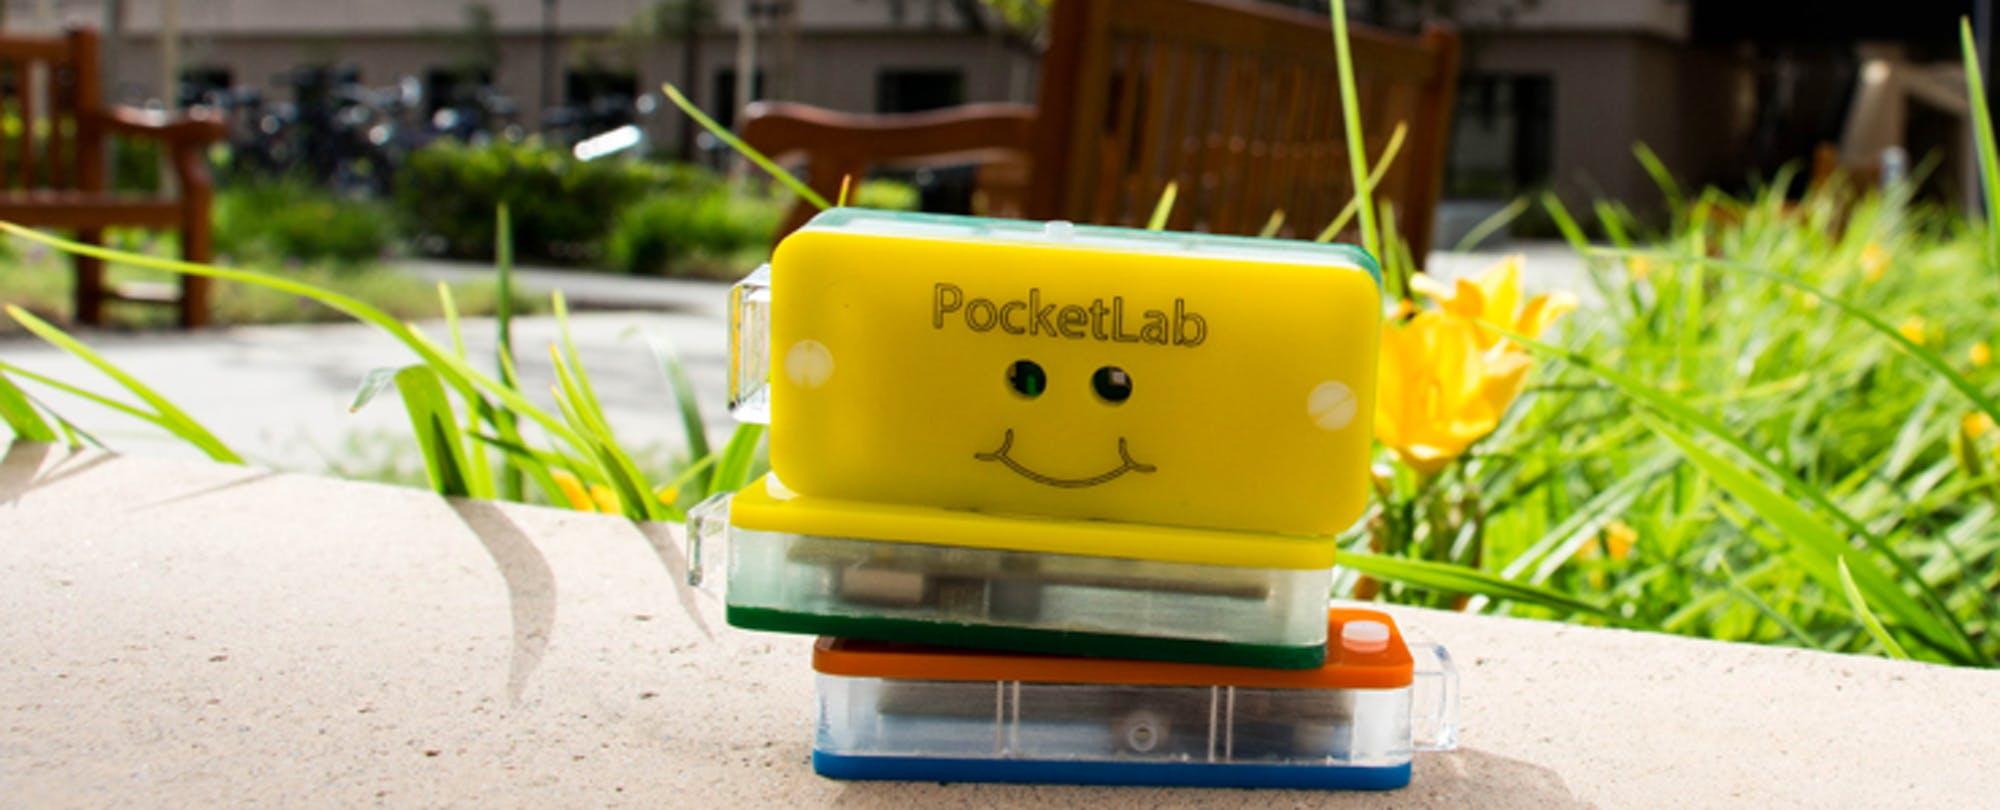 PocketLab Wins Yale Education Business Plan Competition